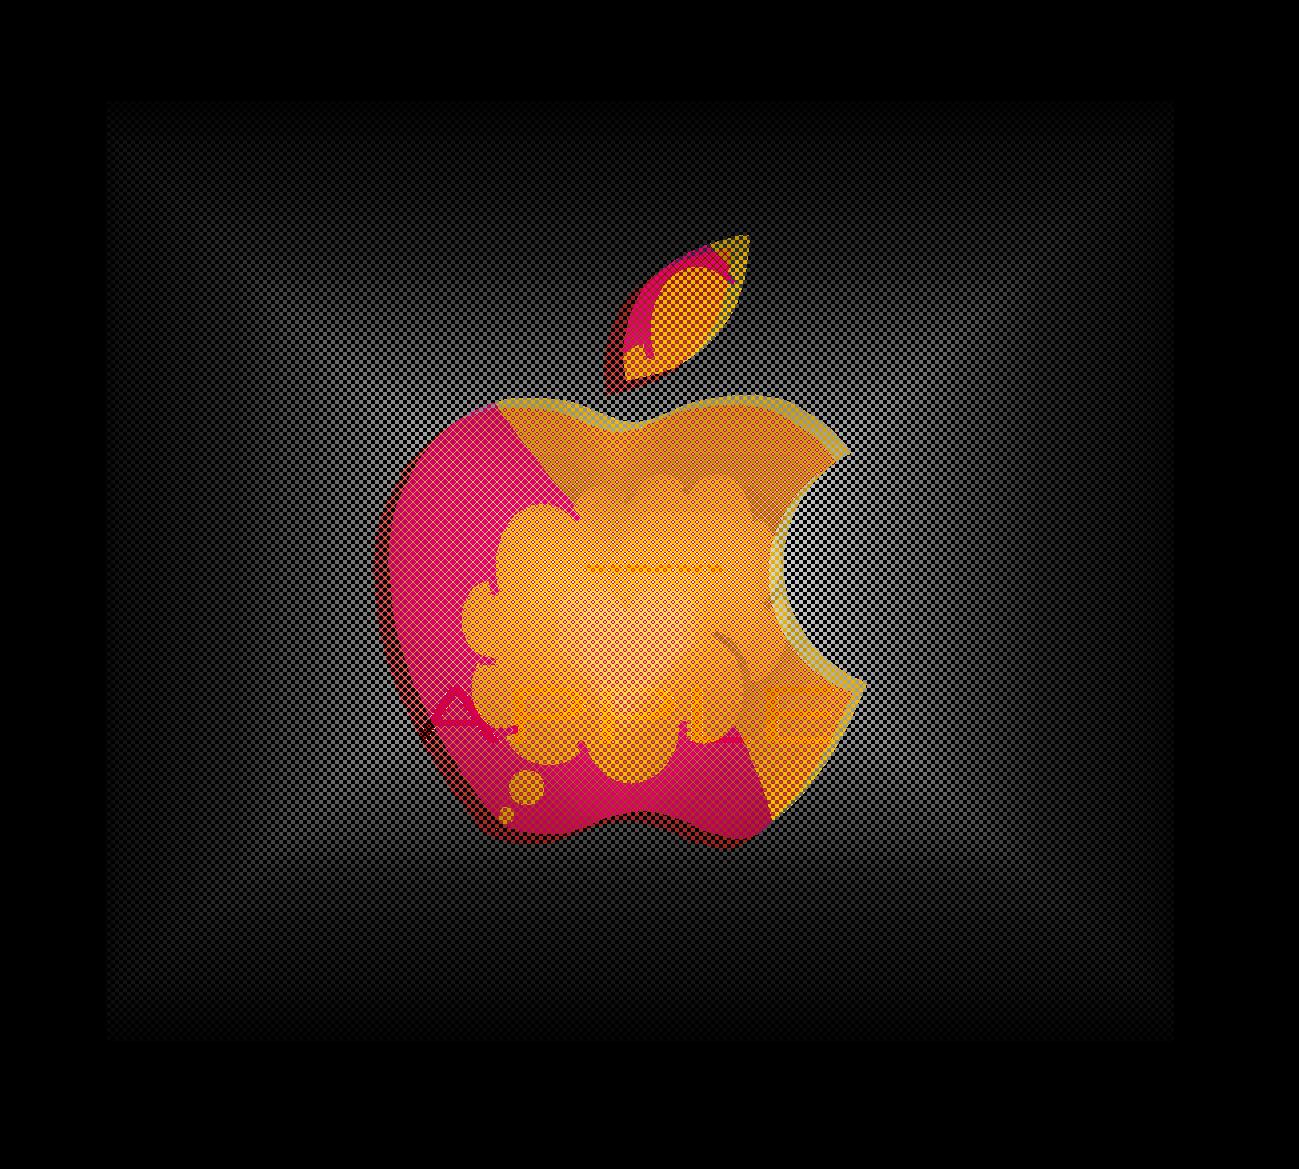 Apple Icloud Logo Apple Wallpaper Iphone Apple Logo